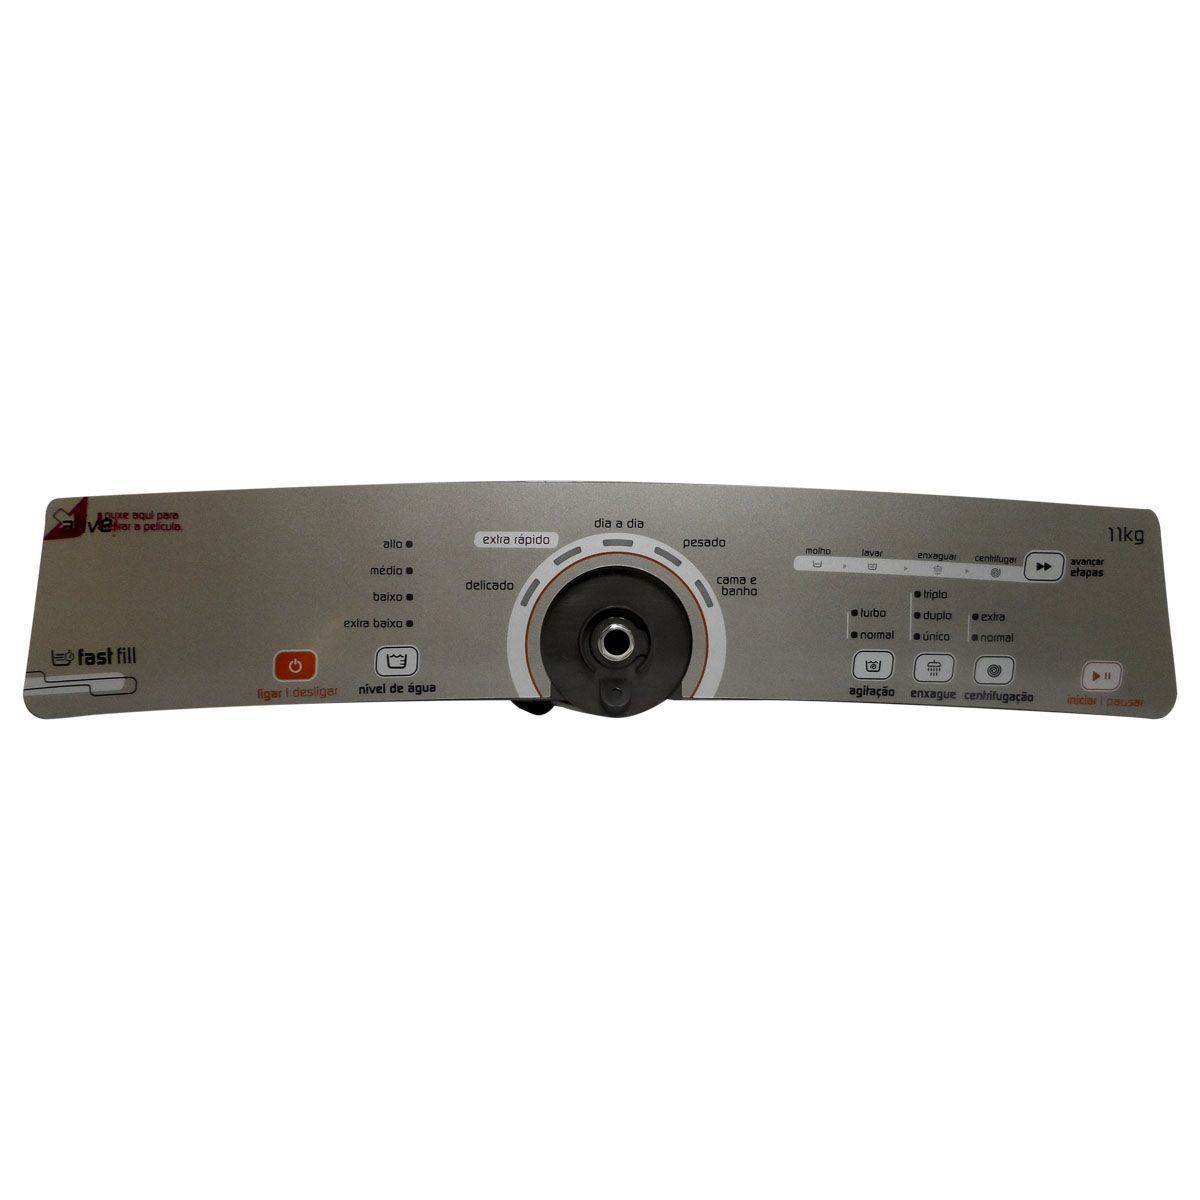 PLACA INTERFACE INOX BRASTEMP BIVOLT W10463584